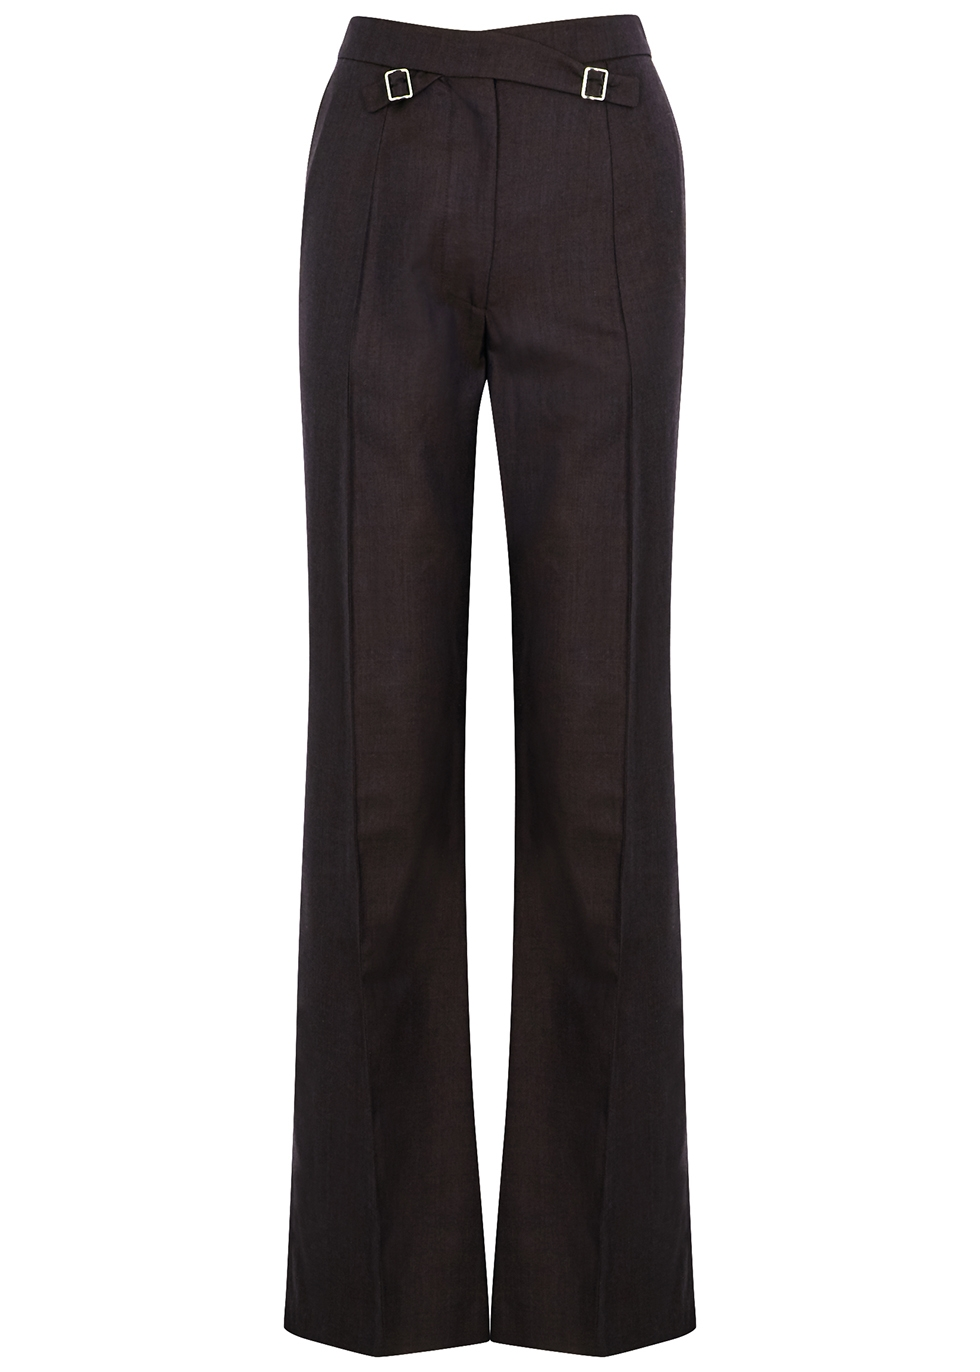 Croix maroon straight-leg wool trousers